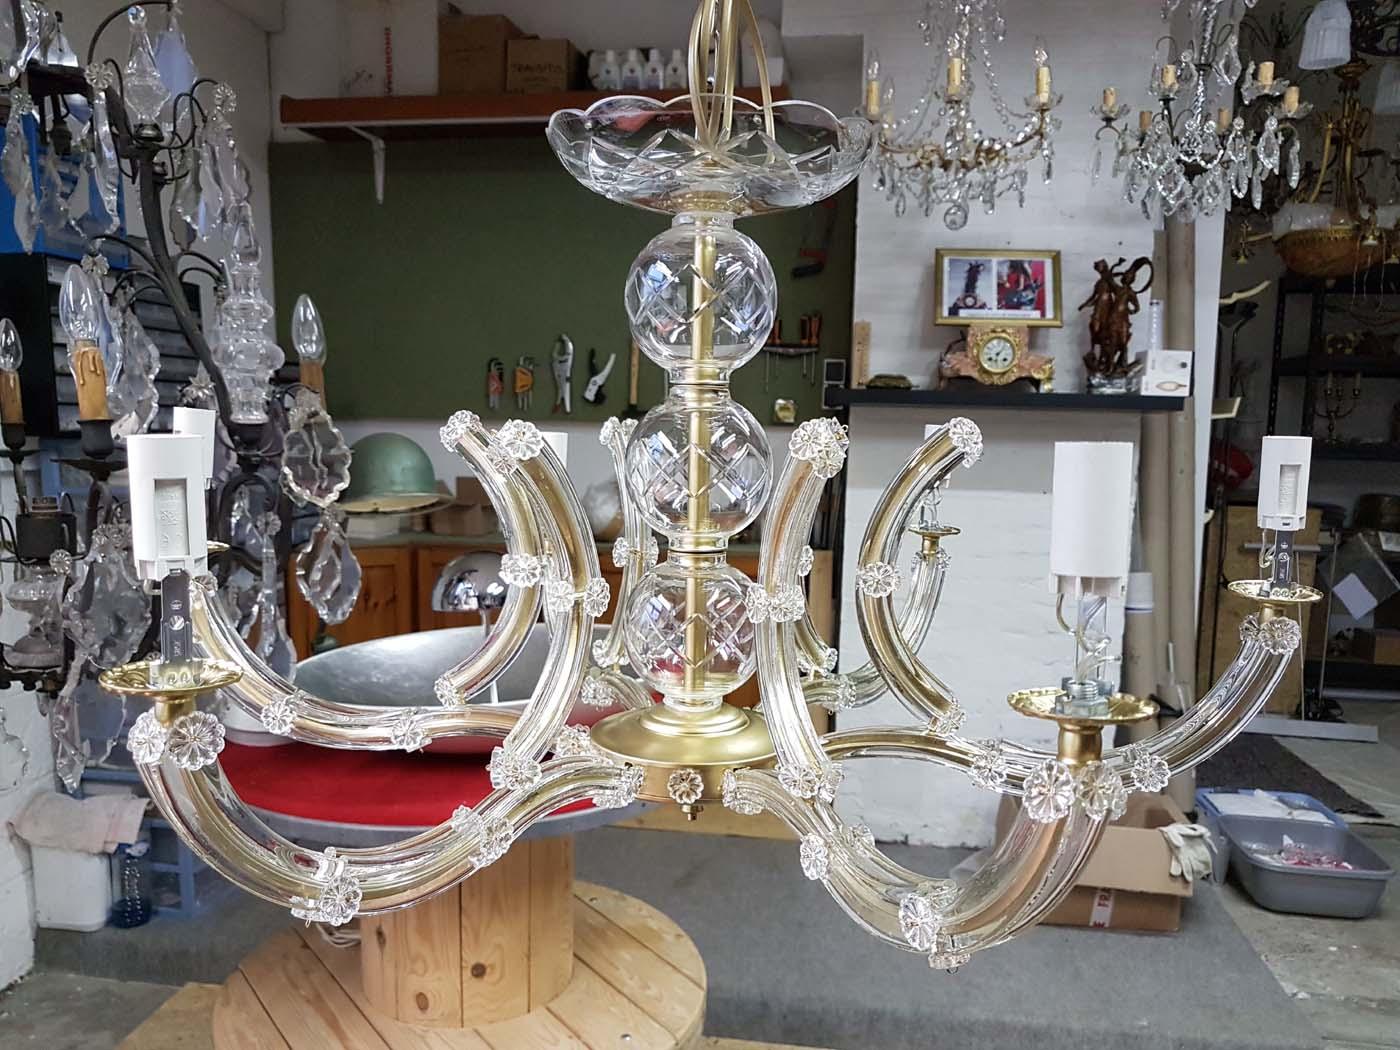 remontage-cablage-lustre-marieantoinette-6-lampes